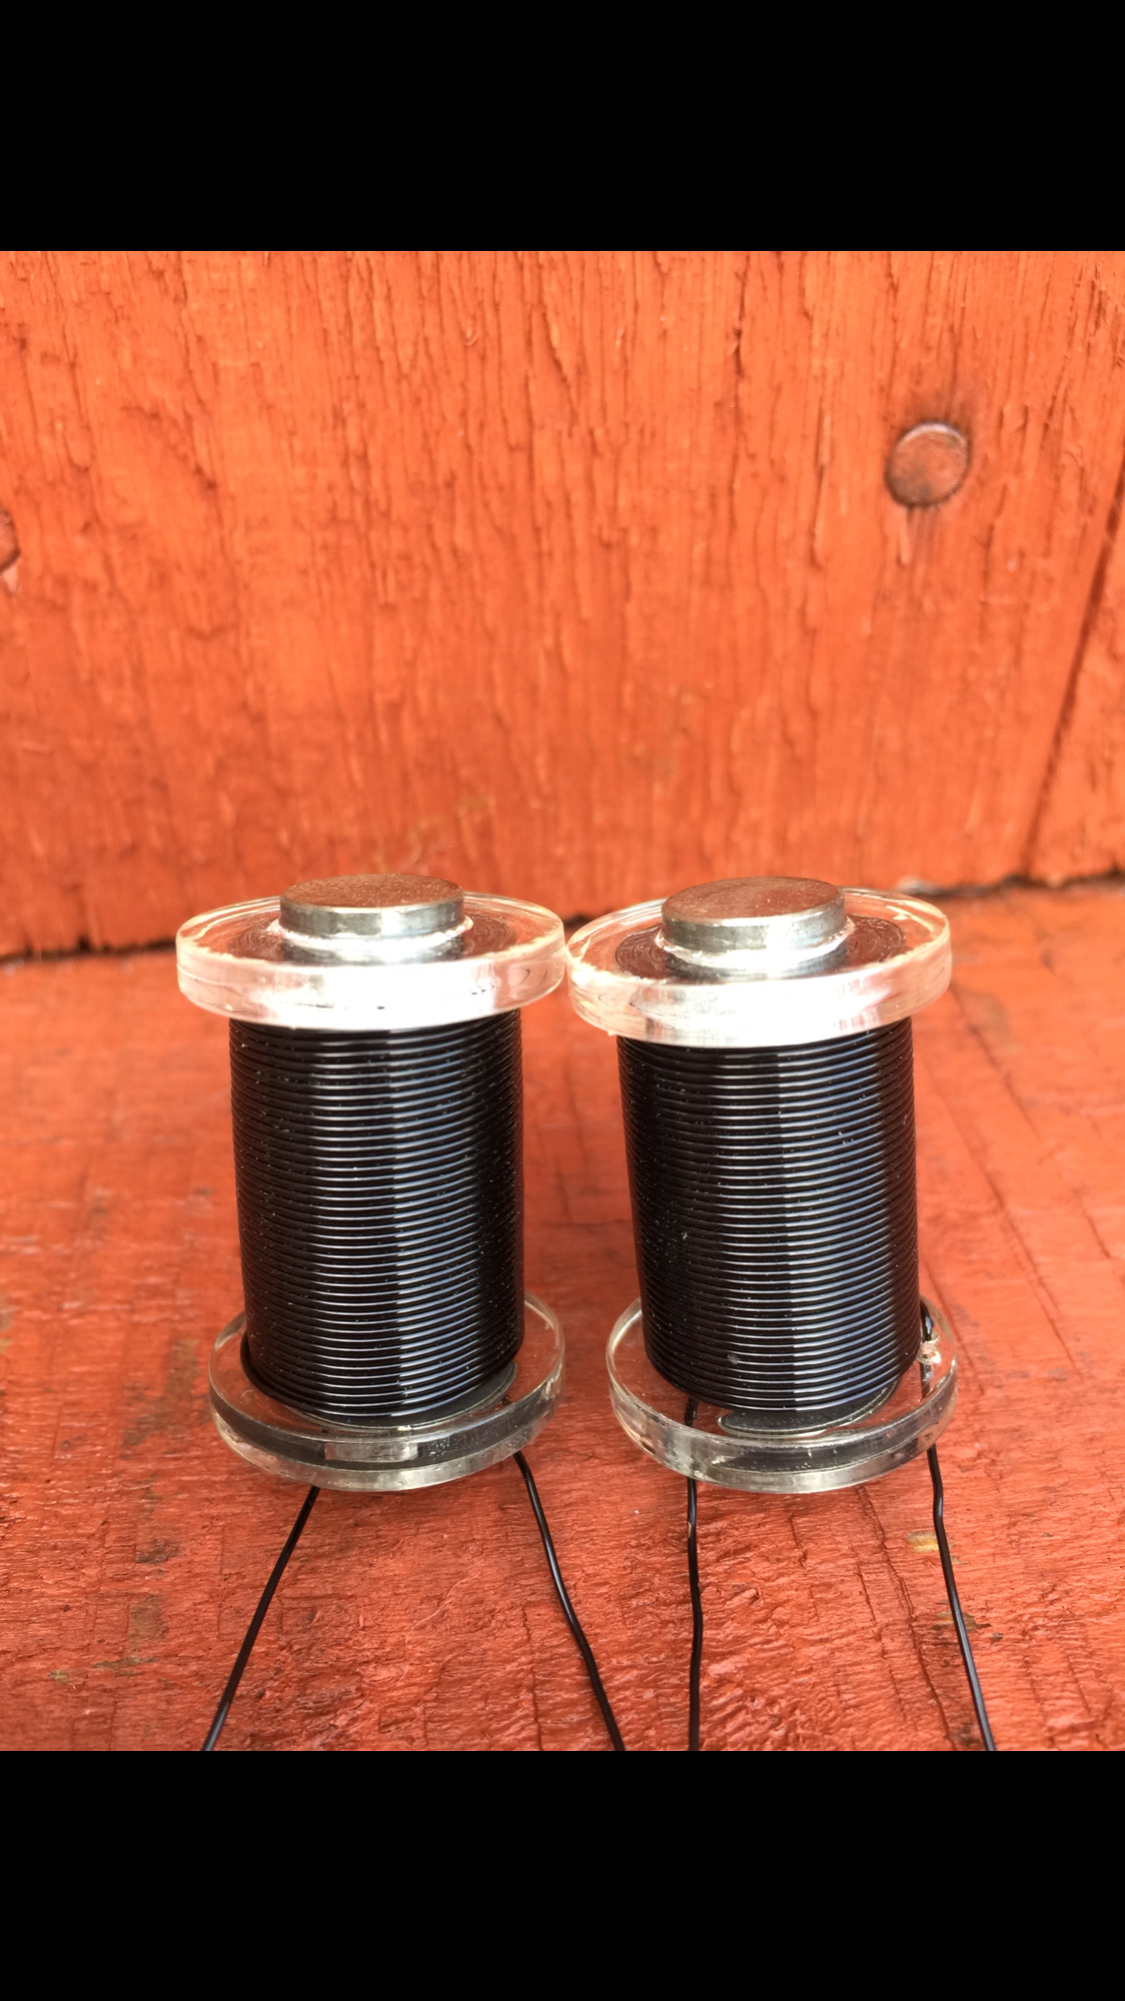 tattoo coils wiring dyna ignition coils wiring diagram for kz1000 mk2 1980 8 layer, 32mm, hand wound tattoo machine coil black wire | aidan macspratt